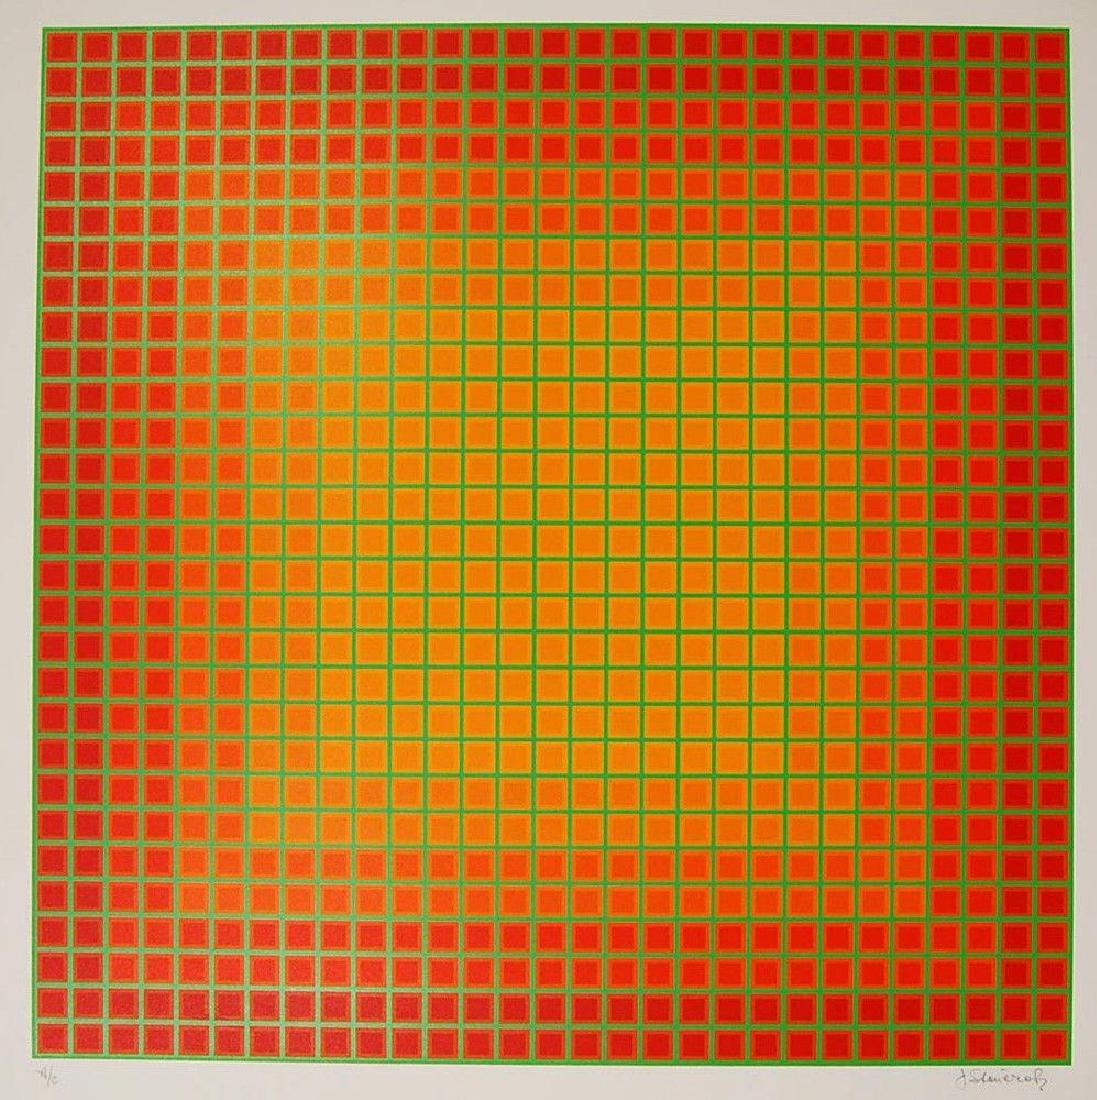 Continual, 1979 Limited Edition Silkscreen, Julian